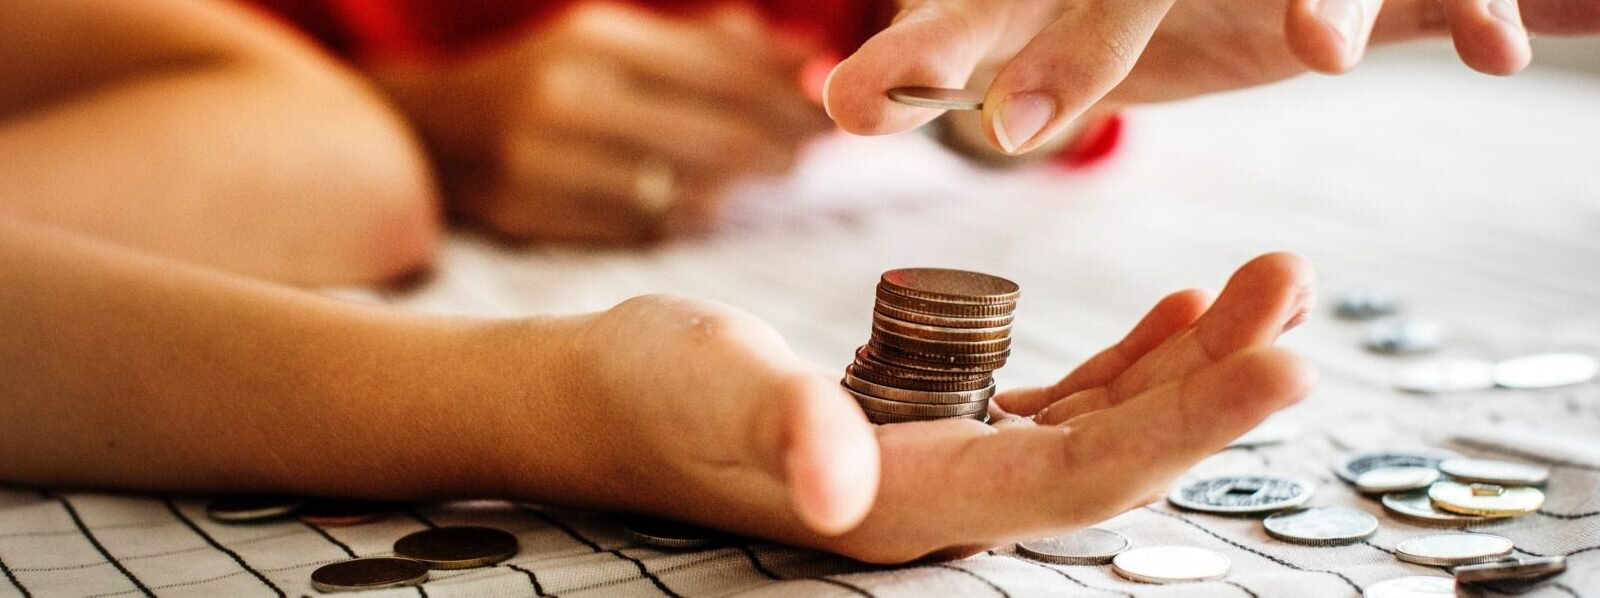 adult-banking-blur-1288483-e1534963354421-1600x598.jpg